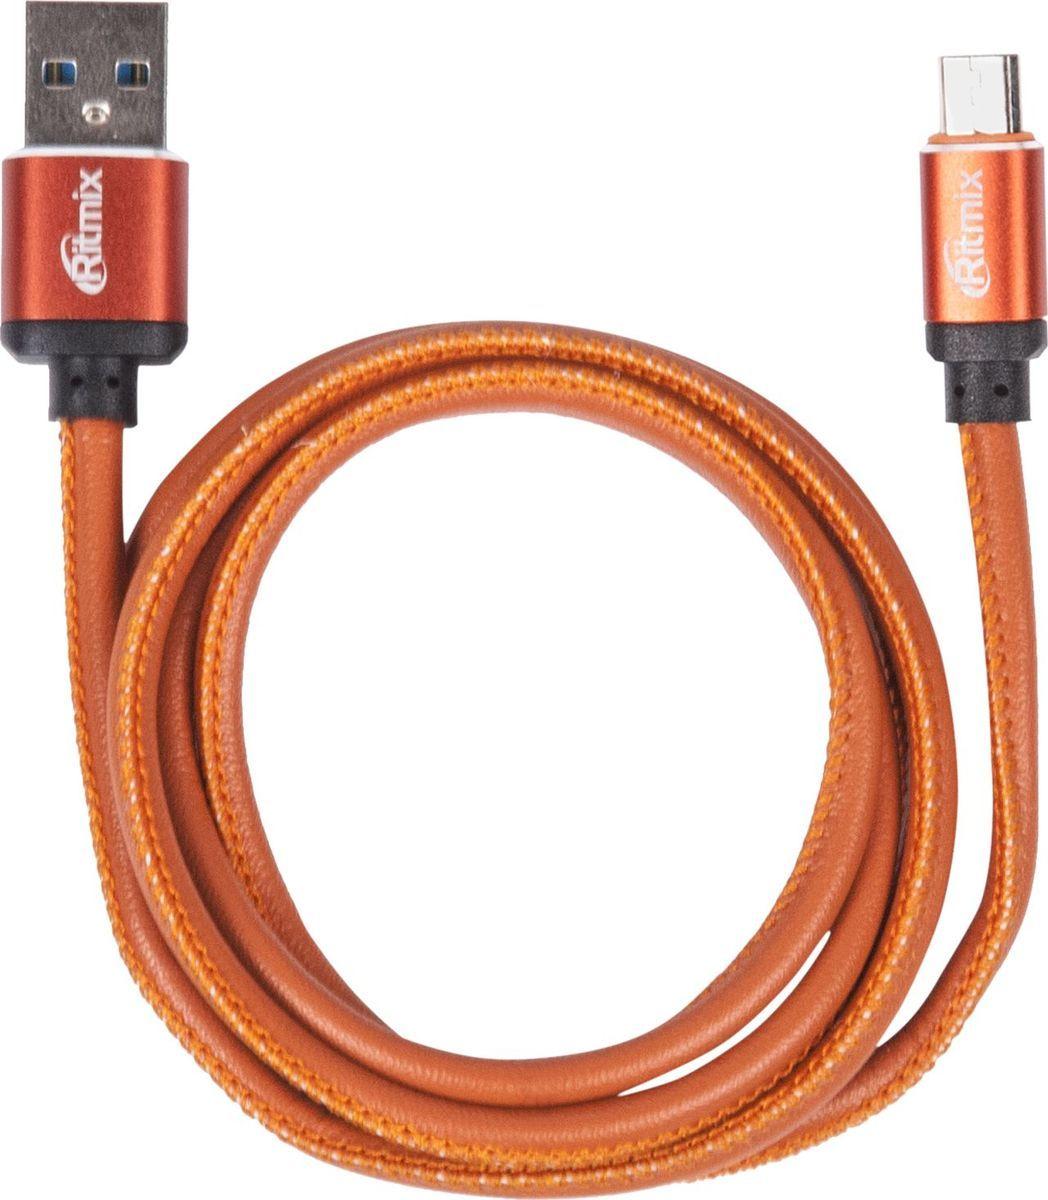 Ritmix RCC-415, Leather кабель USB - microUSB (1 м)